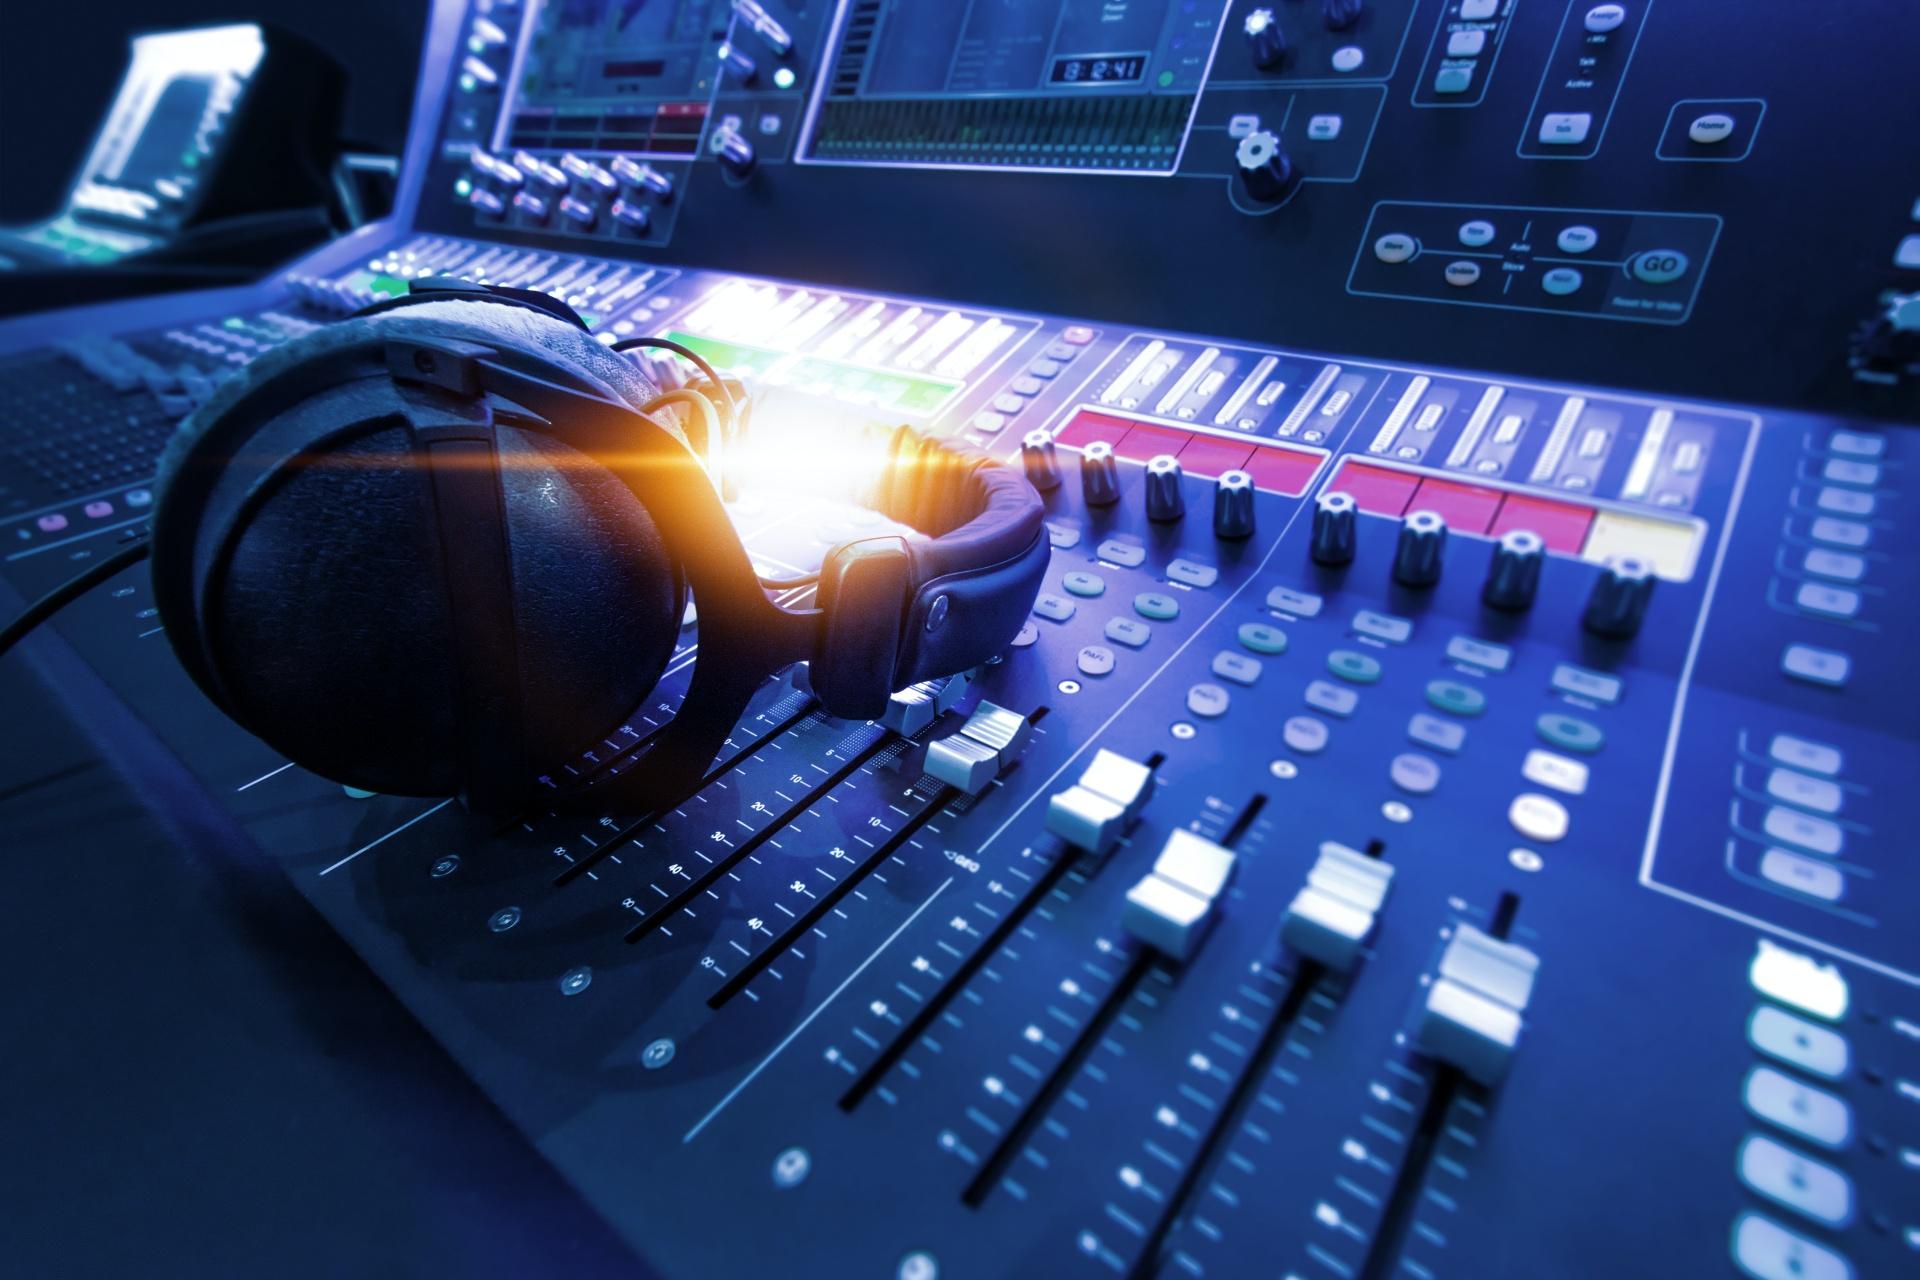 Radio station soundboard with headphones on it